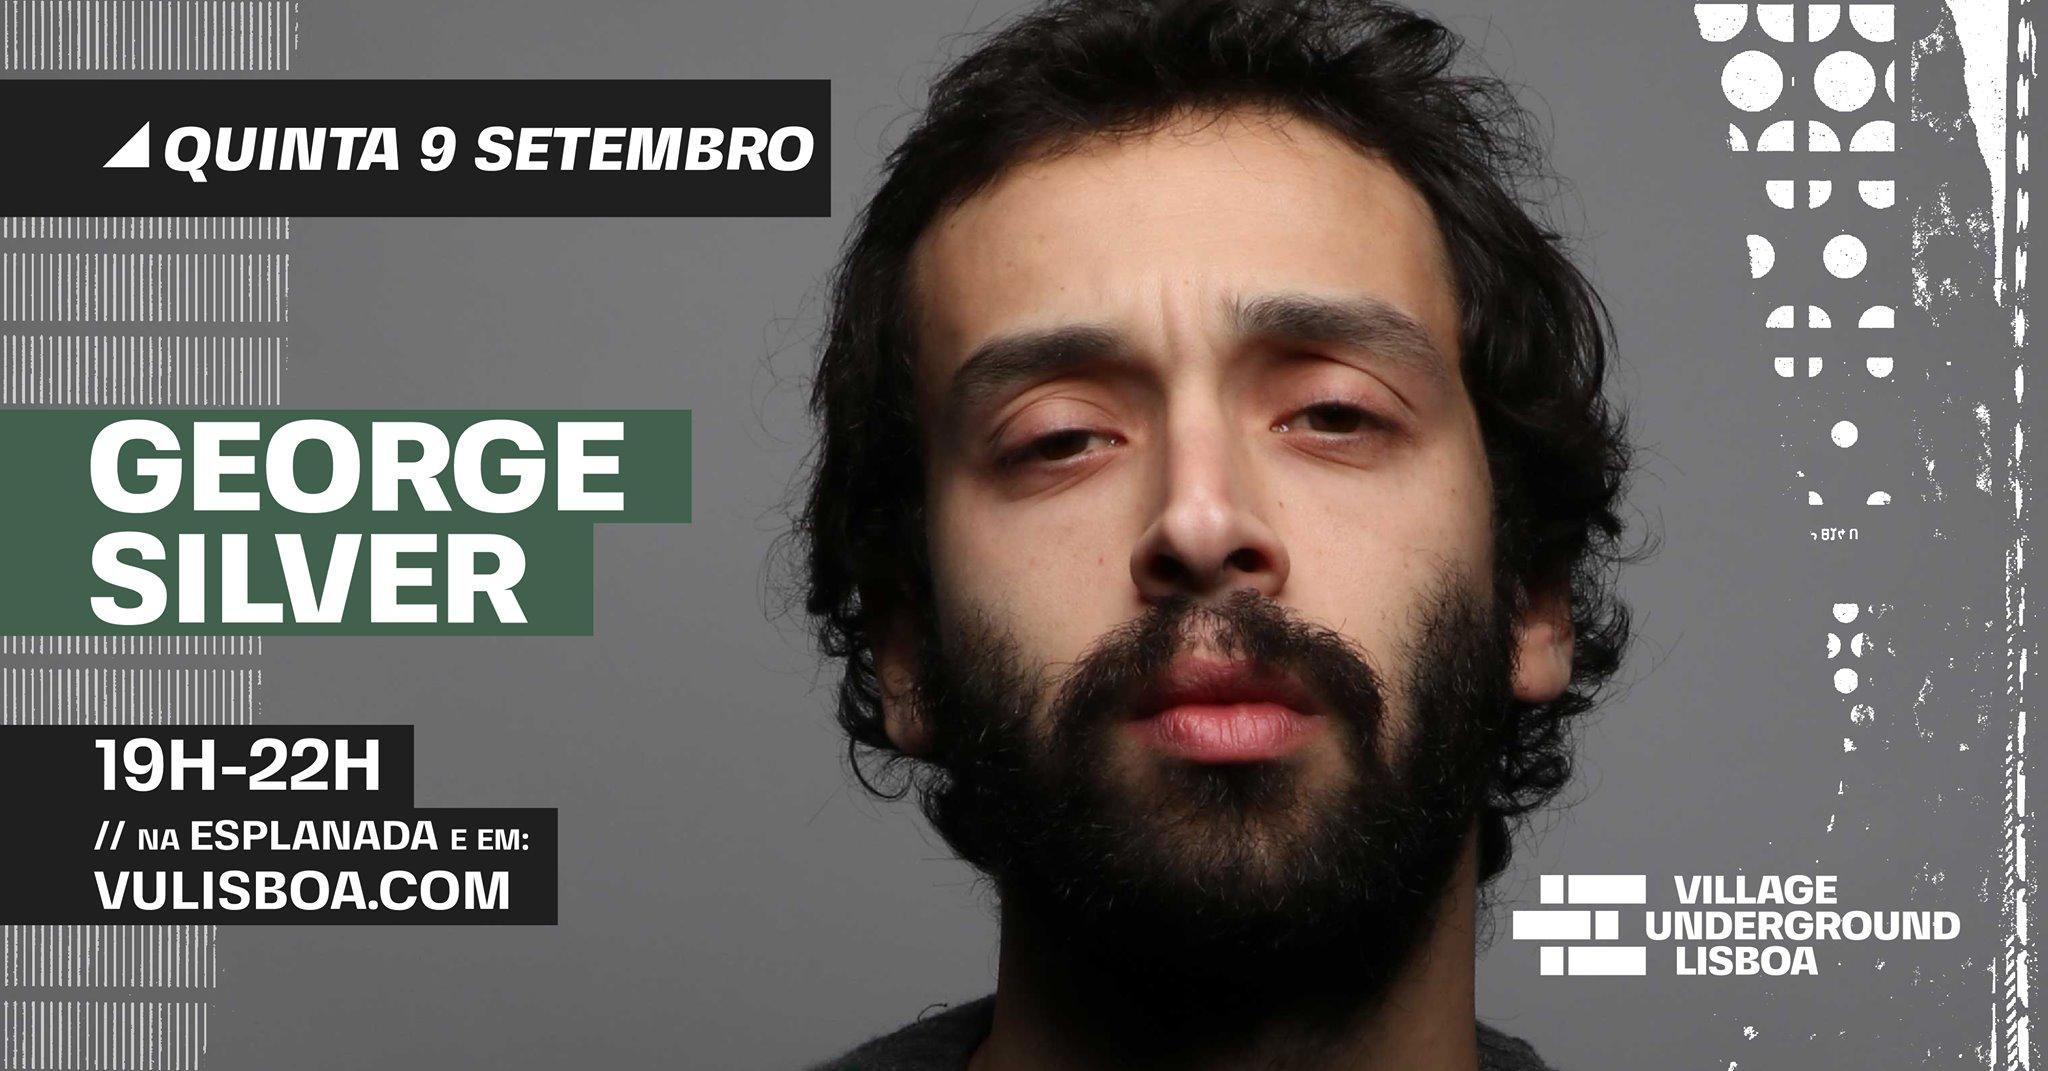 9 Setembro - George Silver // esplanada